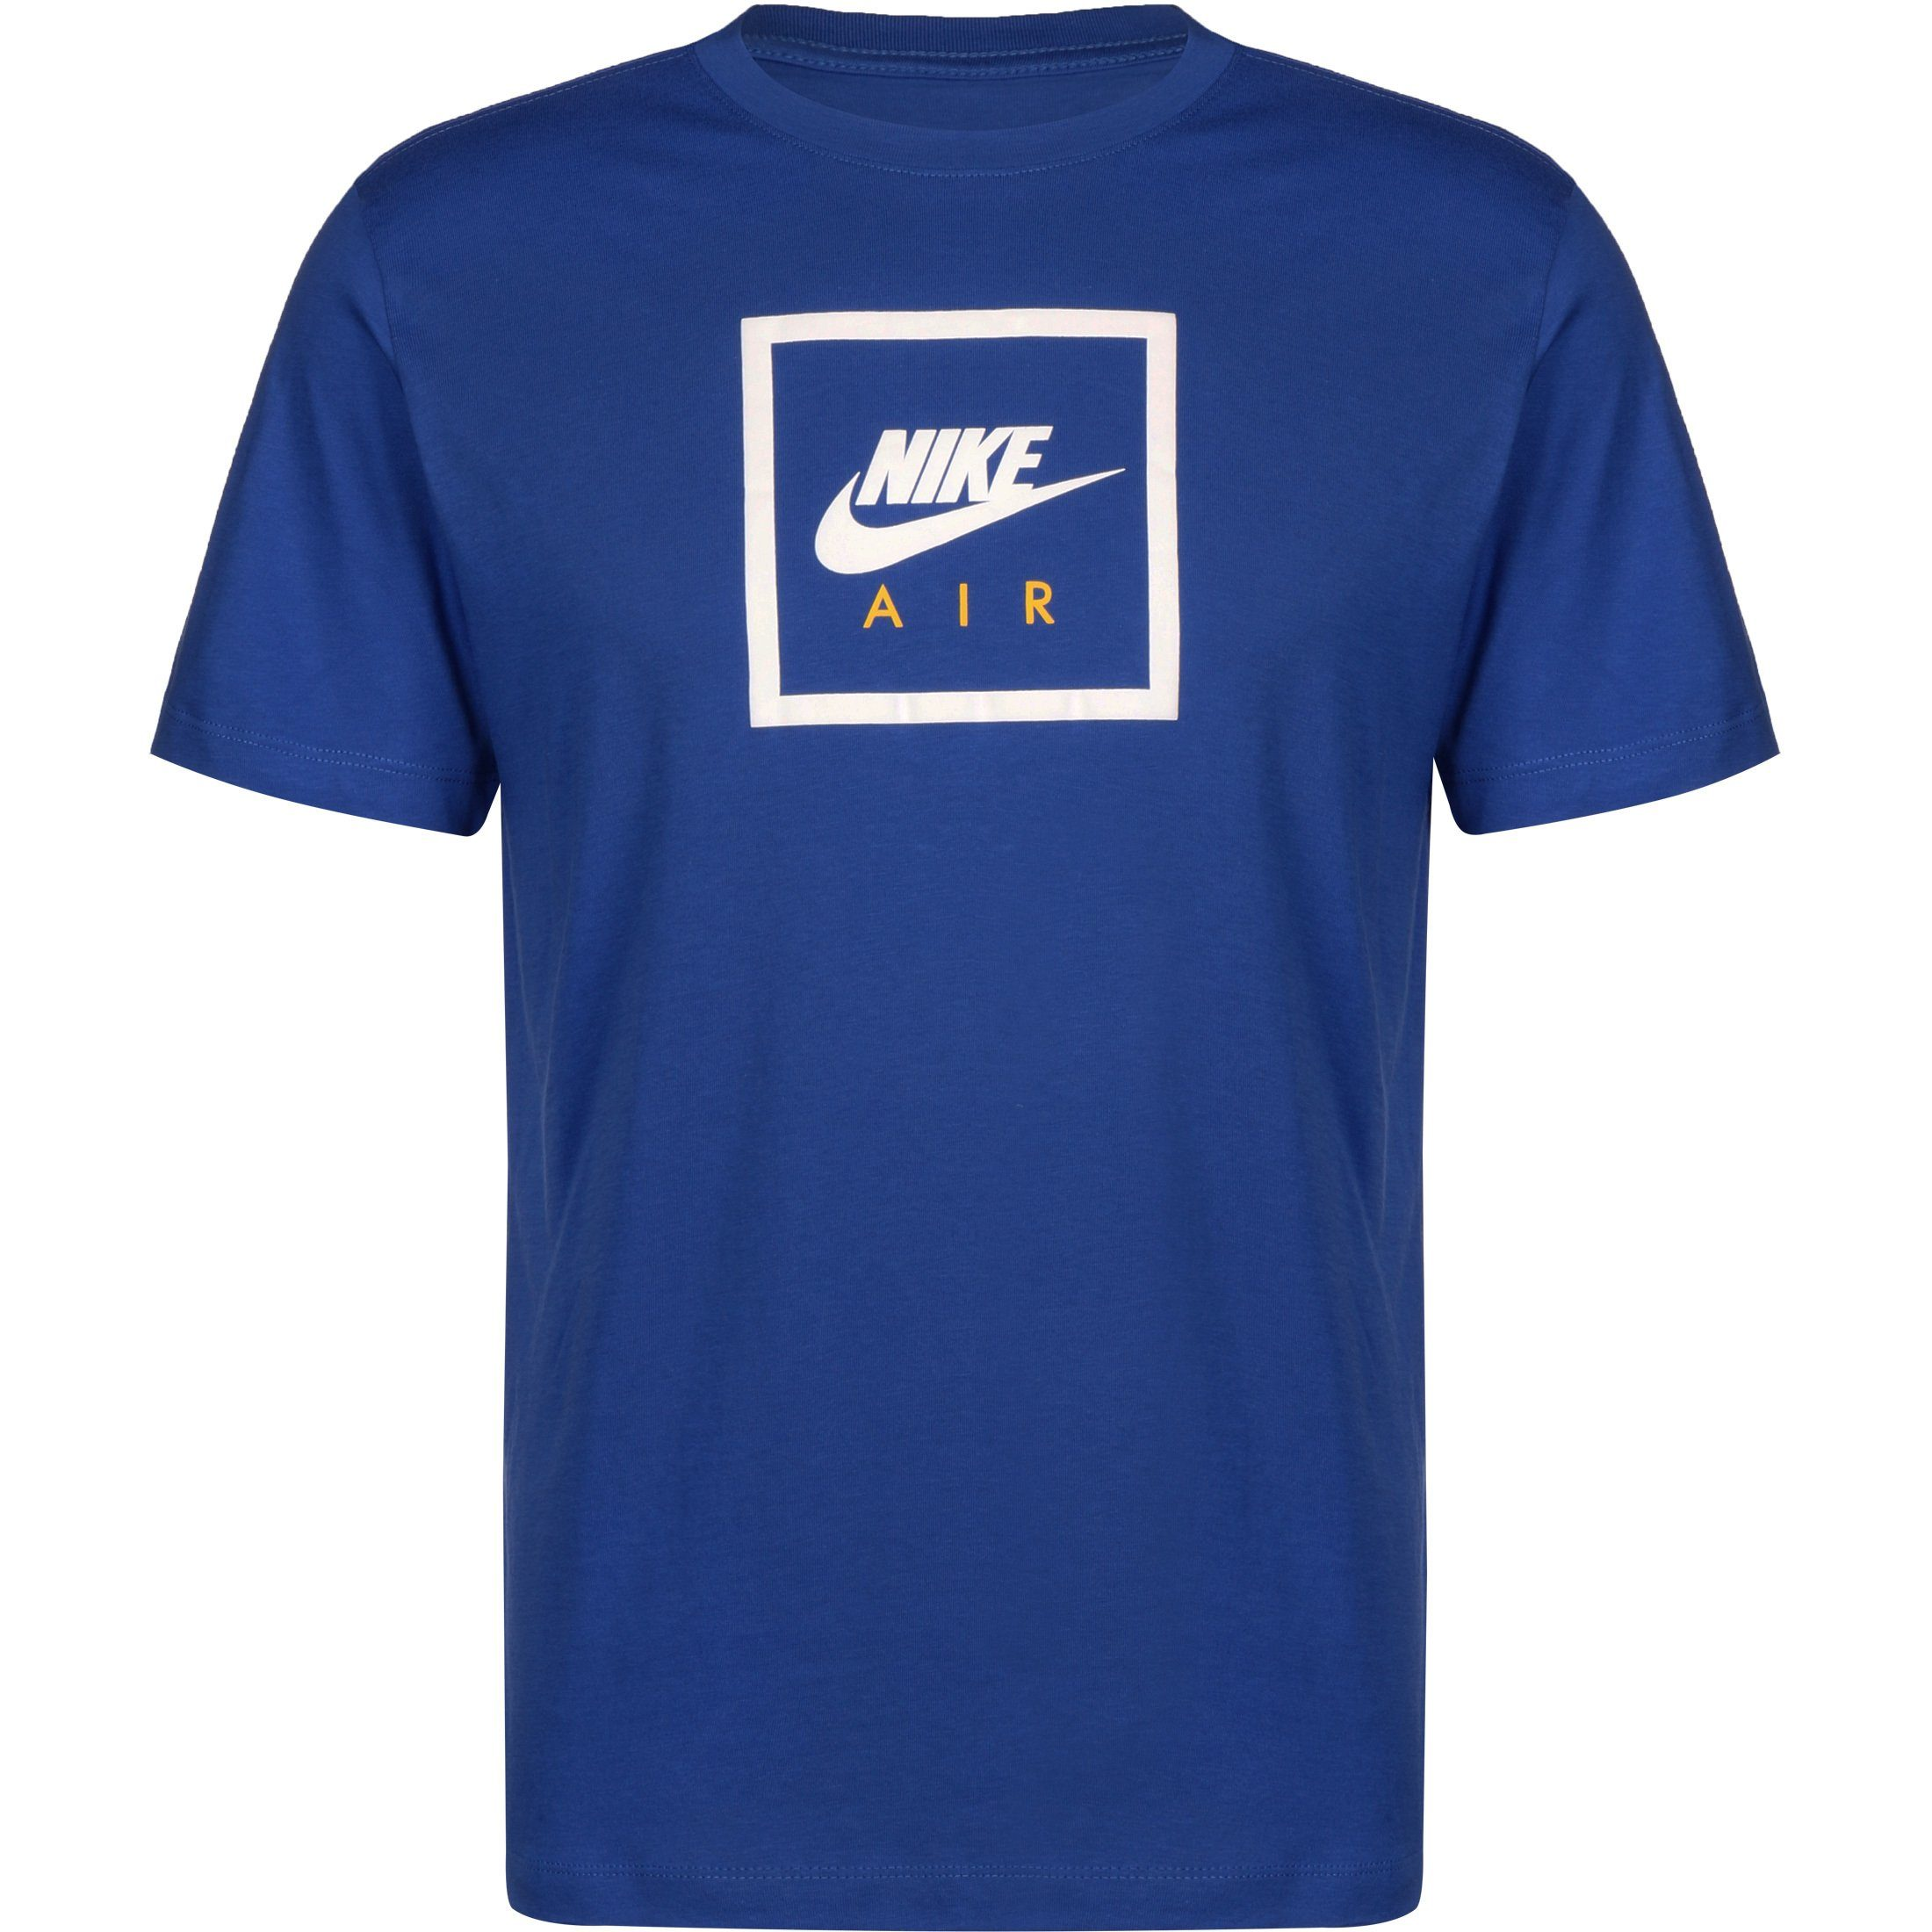 Nike Sportswear T-Shirt Air 2 | Sportbekleidung > Sportshirts > T-Shirts | Blau | Baumwolle | Nike Sportswear